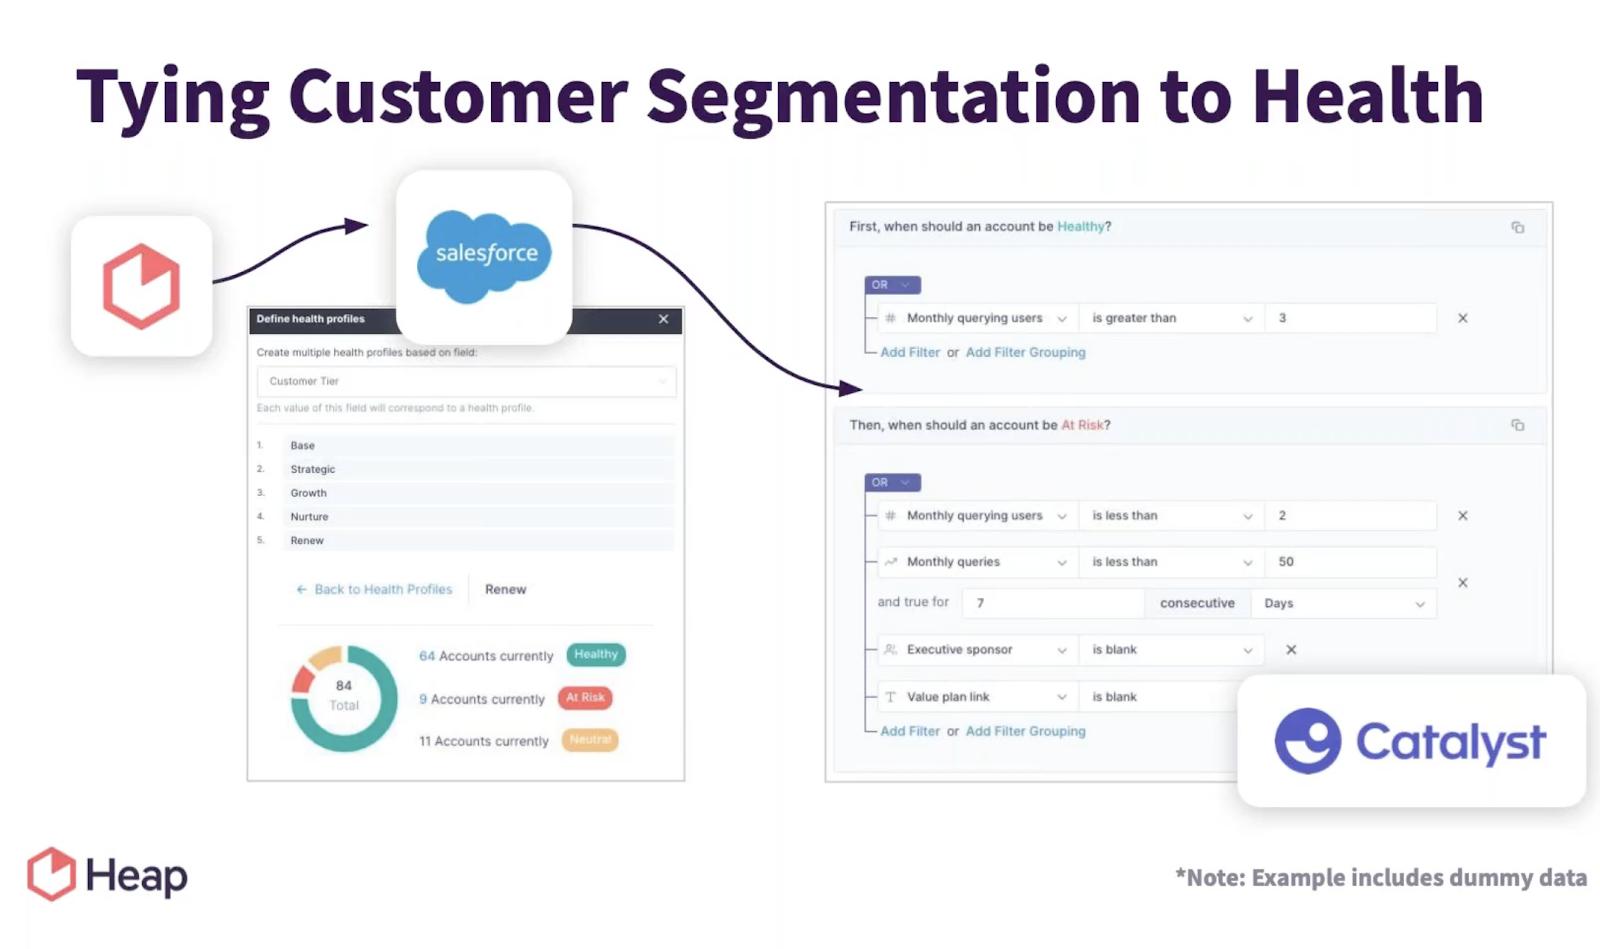 Customer Segmentation and Customer Health Scores